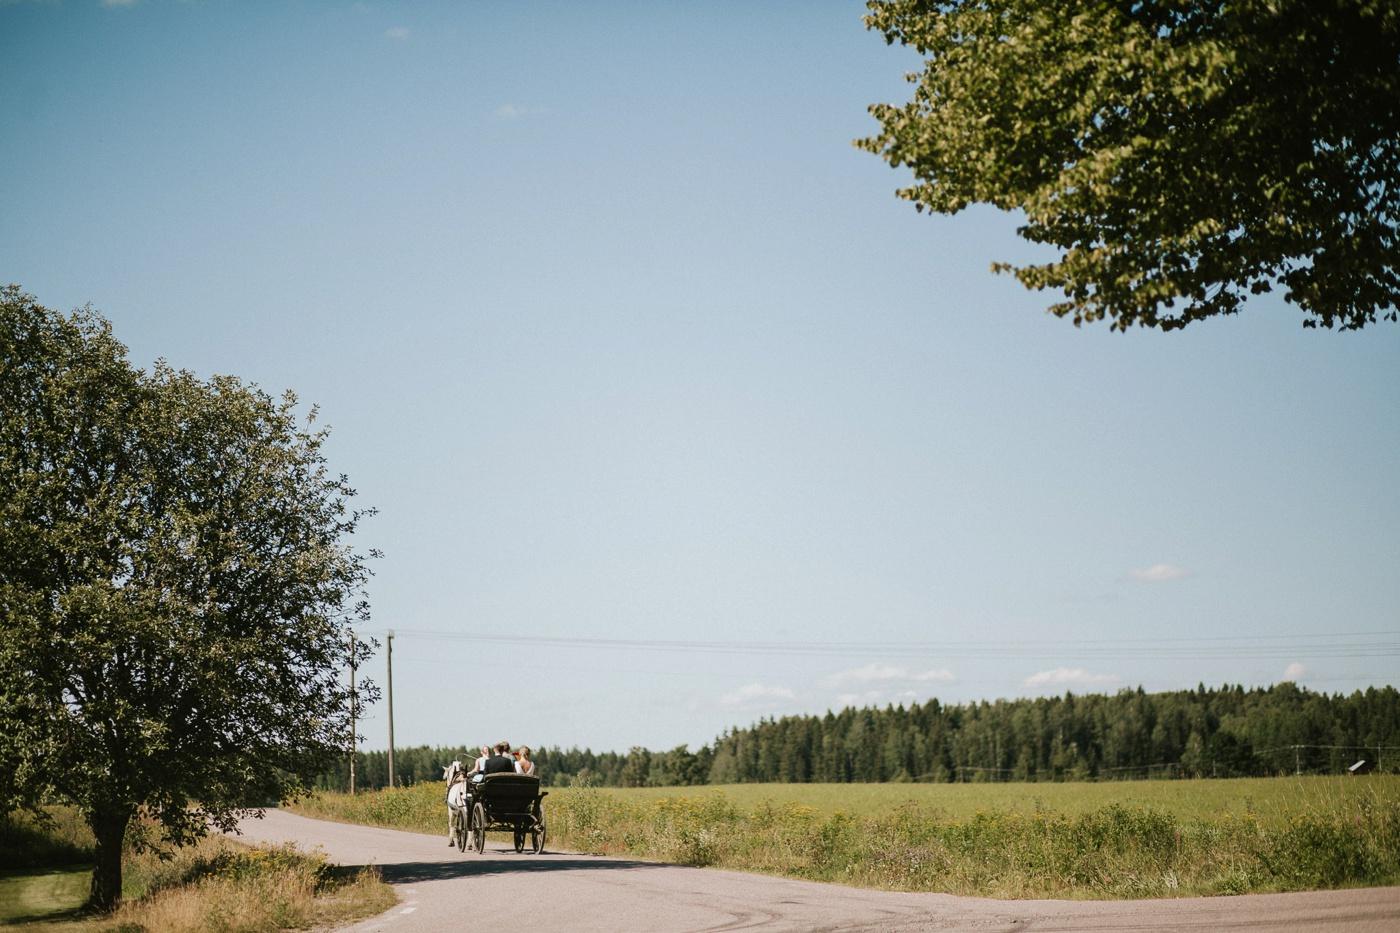 ceciliajoakim_sweden-countryside-summer-wedding_melbourne-fun-quirky-wedding-photography_31